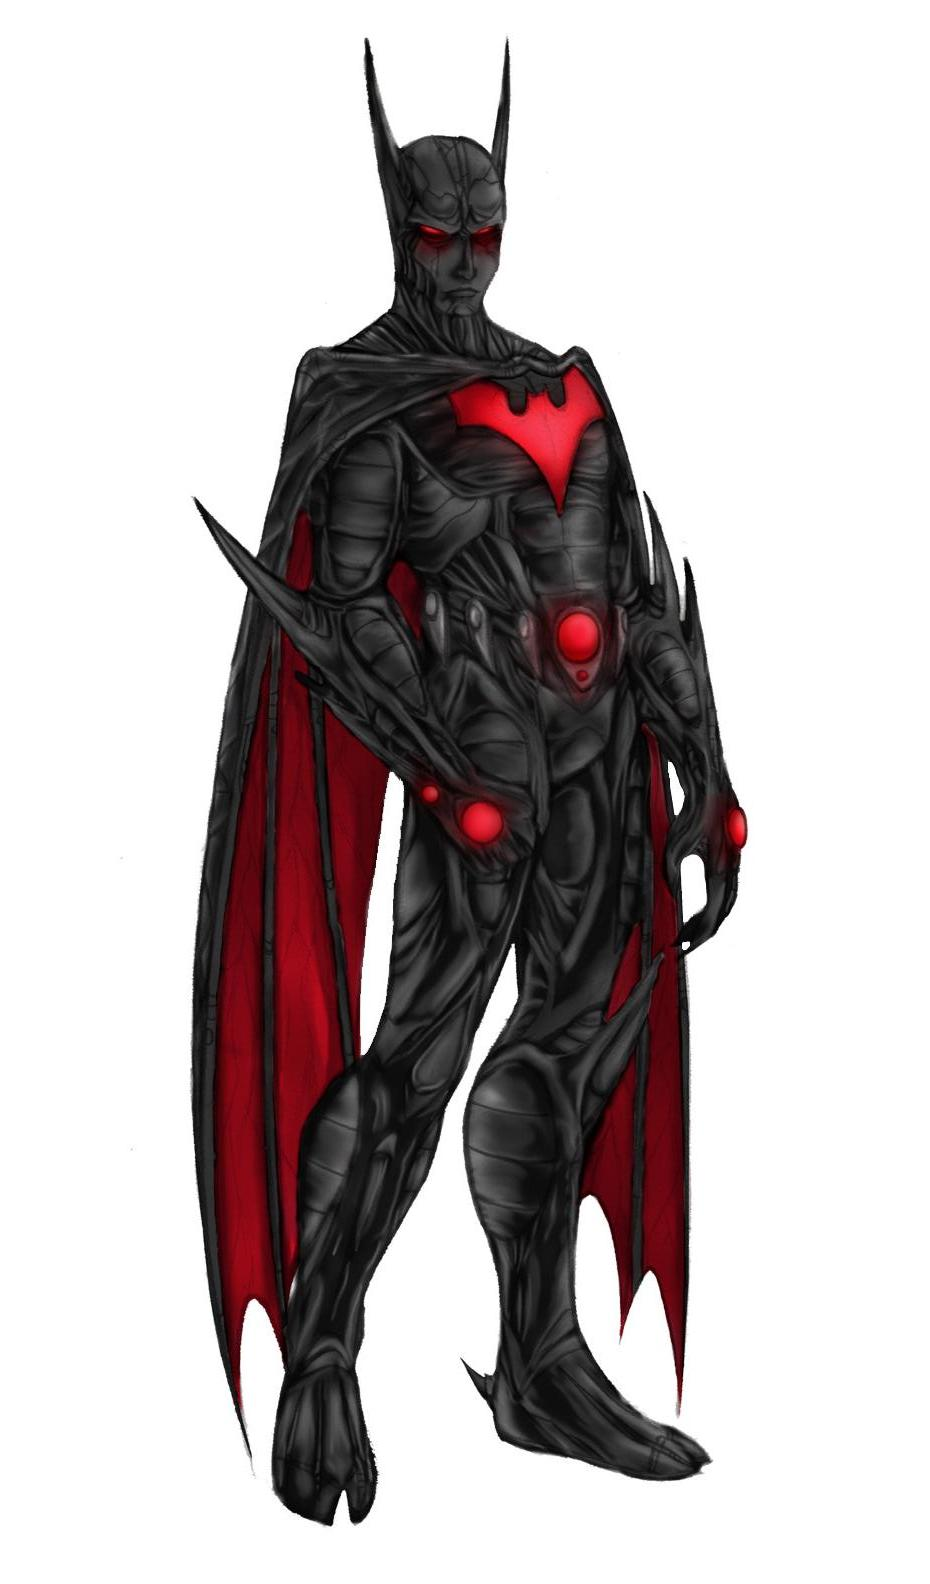 Kids Costume Suit Of Armor